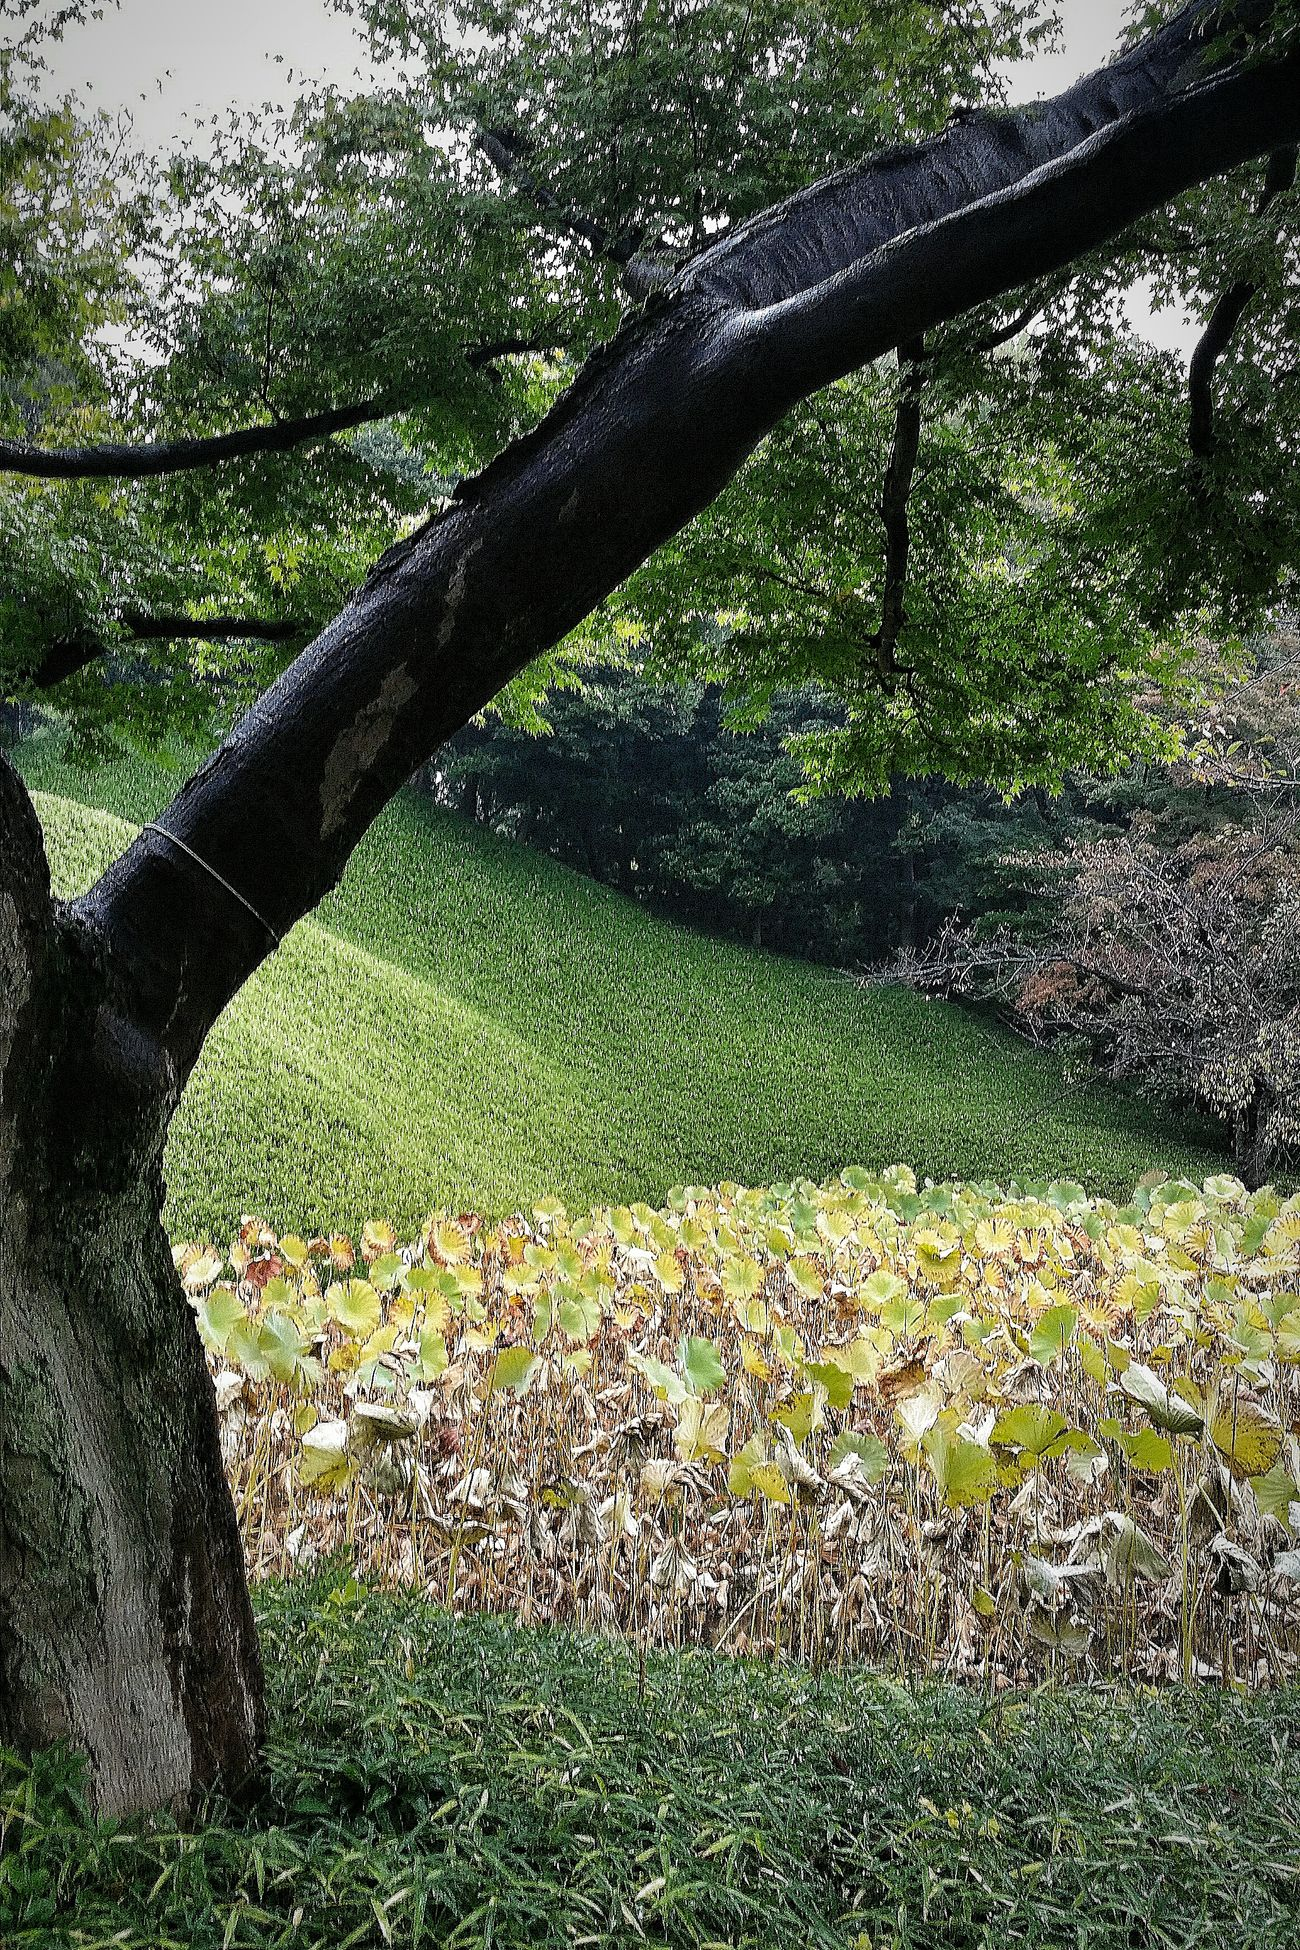 Lotus Pond Koishikawa Korakuen Nature EyeEm Nature Lover Naturelover Nature Photography Nature_collection Tokyo Nature Autumn 2015 Tokyo Autumn 2015 Tokyo Japan Travelphotography